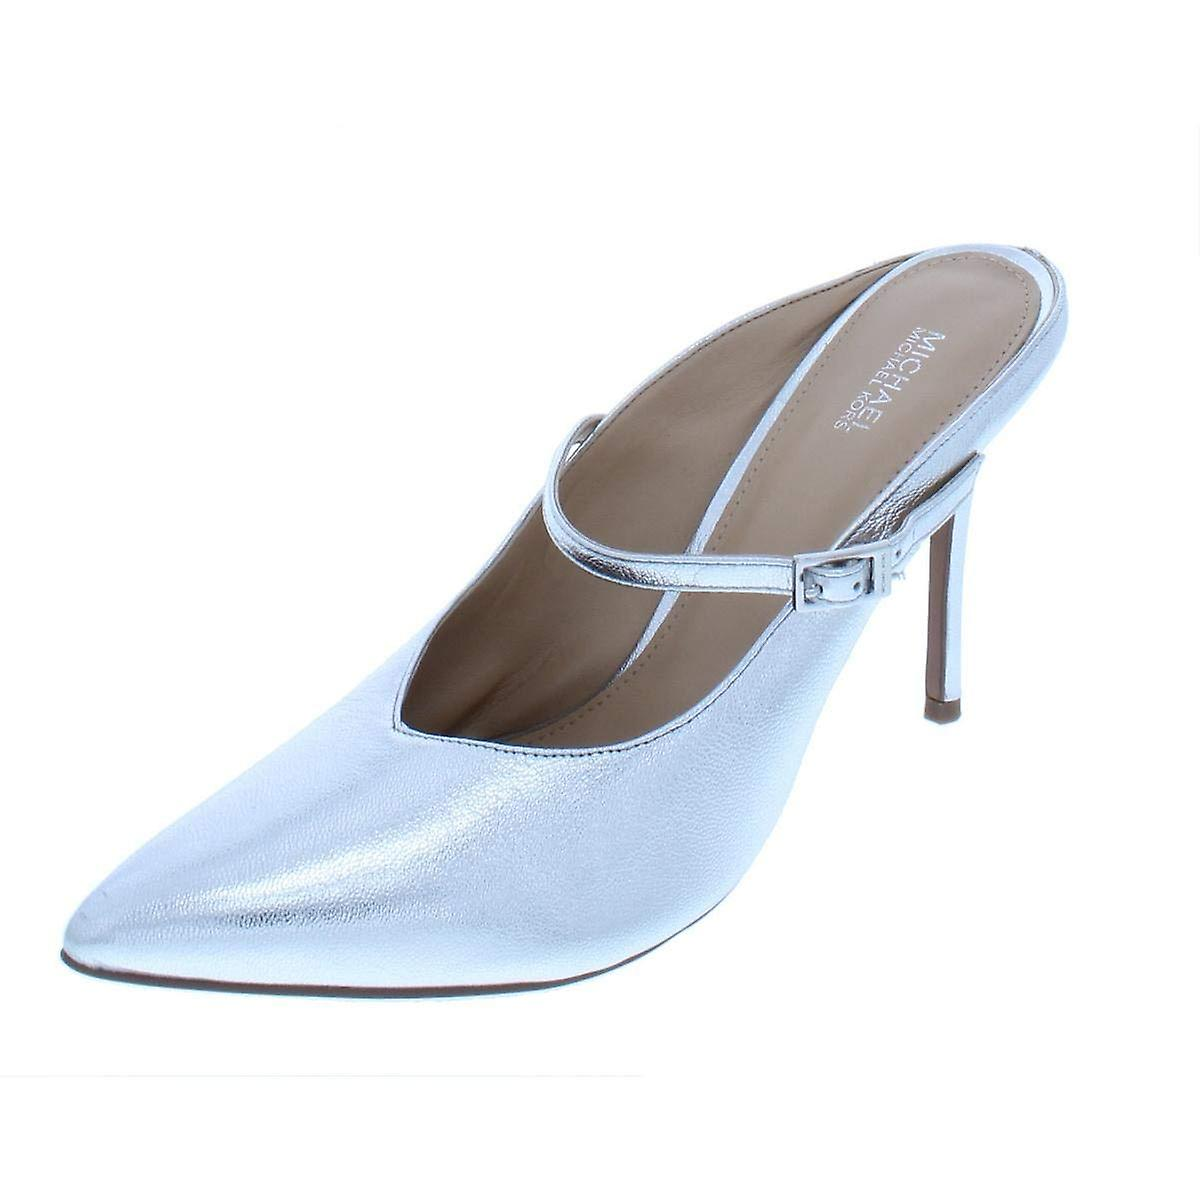 Michael Michael Kors Womens Tiegan Leather Pointed Toe Formal Slide Sandals 3gvDZ